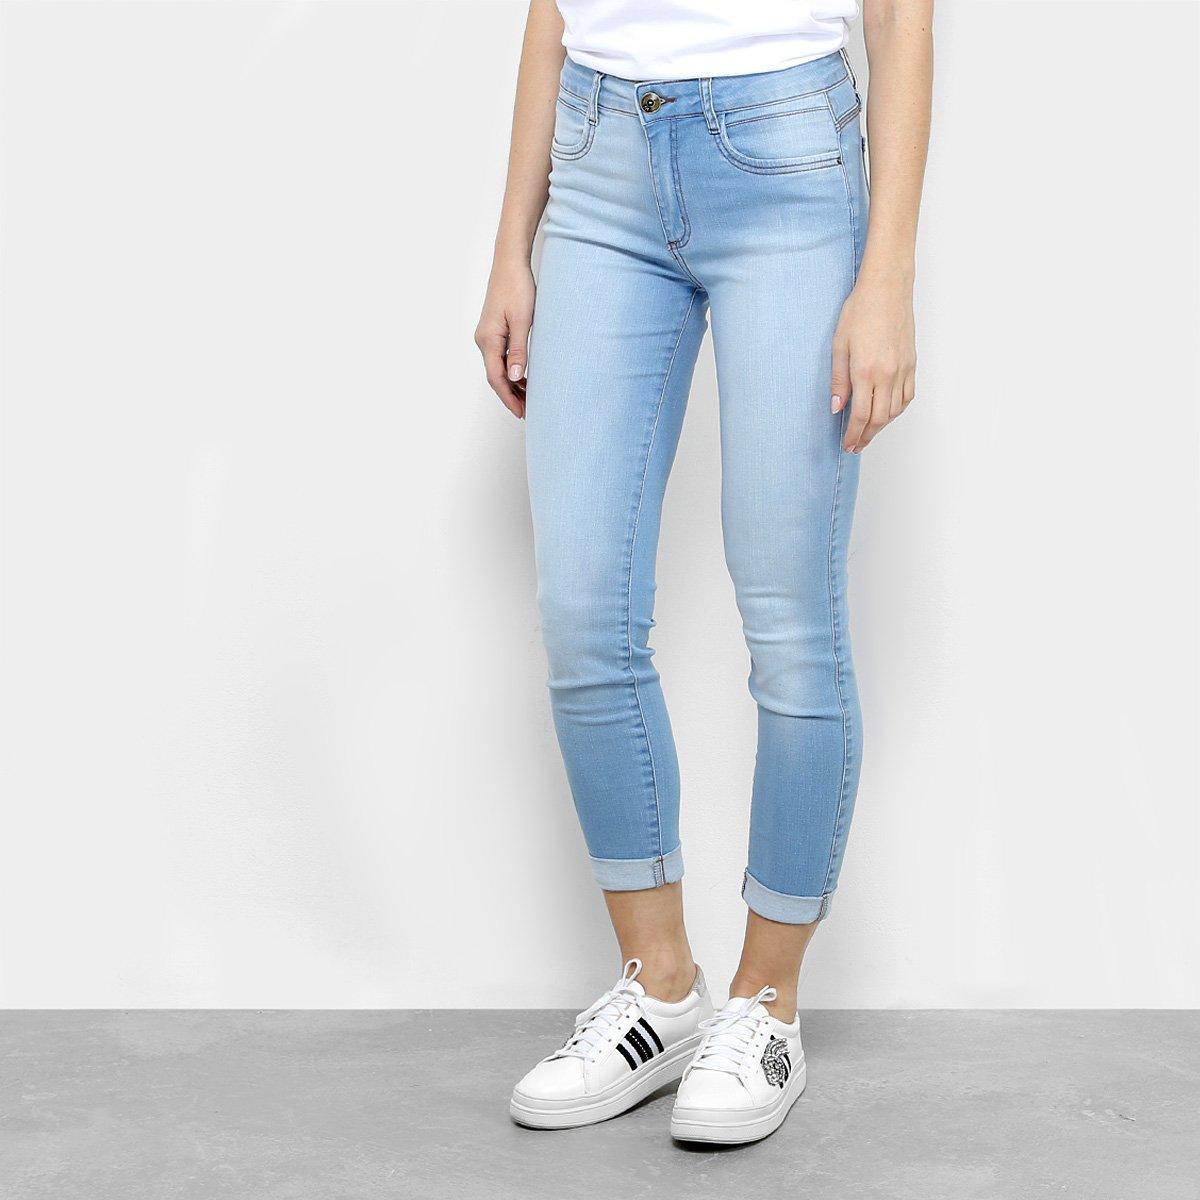 Calça Jeans Skinny Cropped My Favorite Thing Cintura Média Feminina